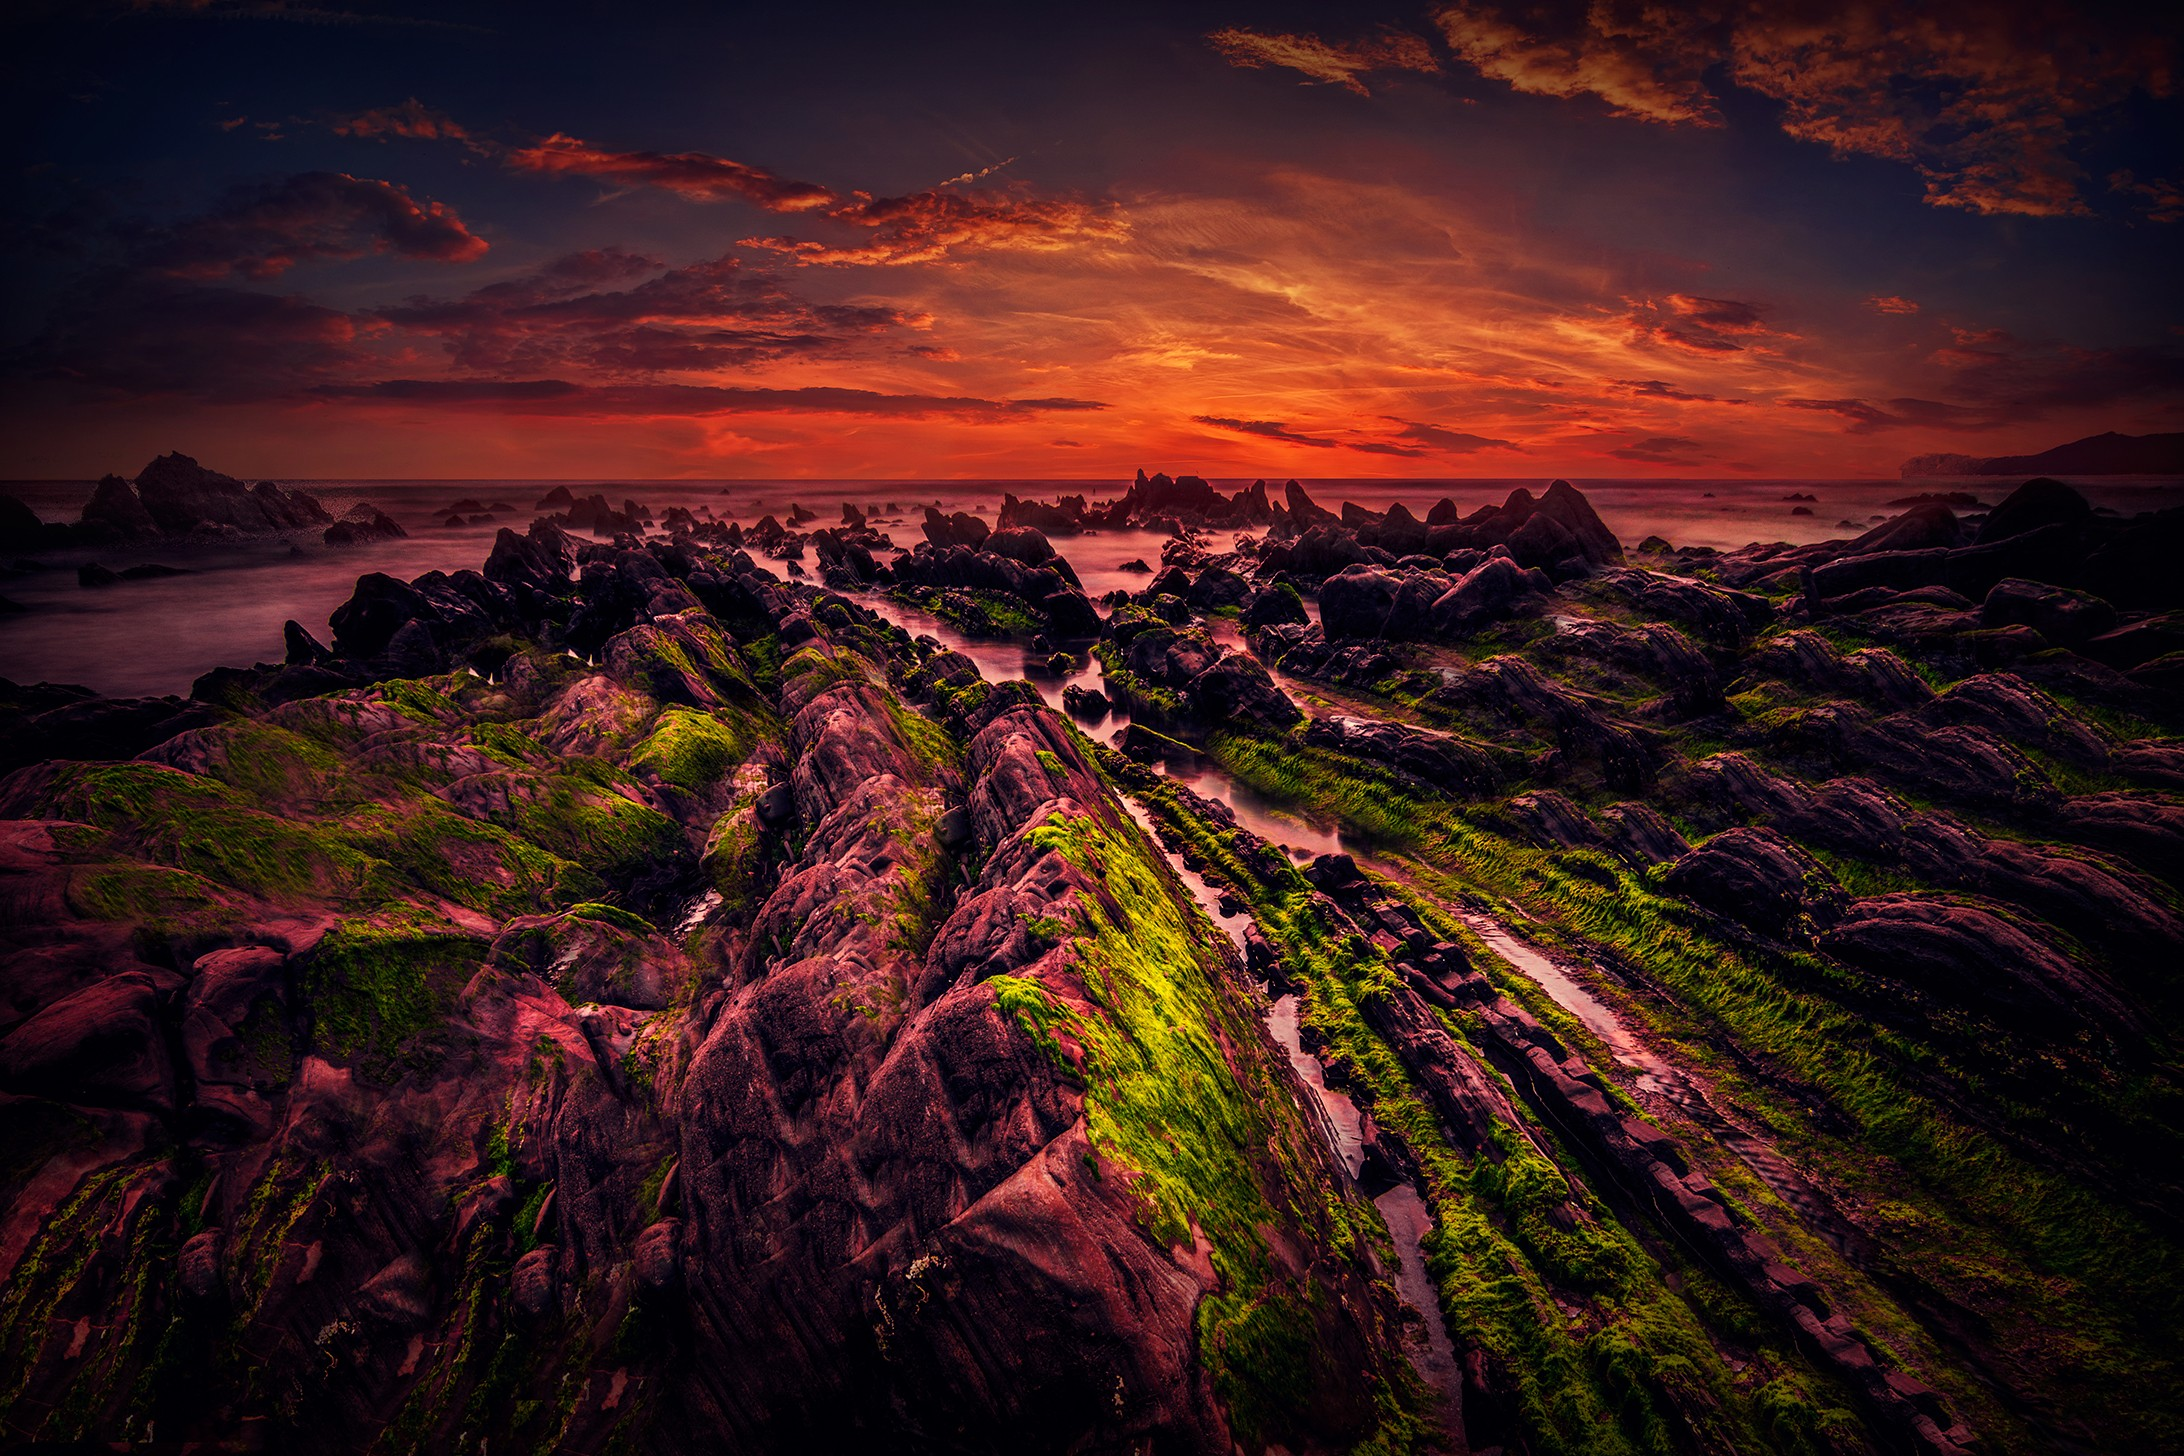 General 2184x1456 sunset sky dark nature